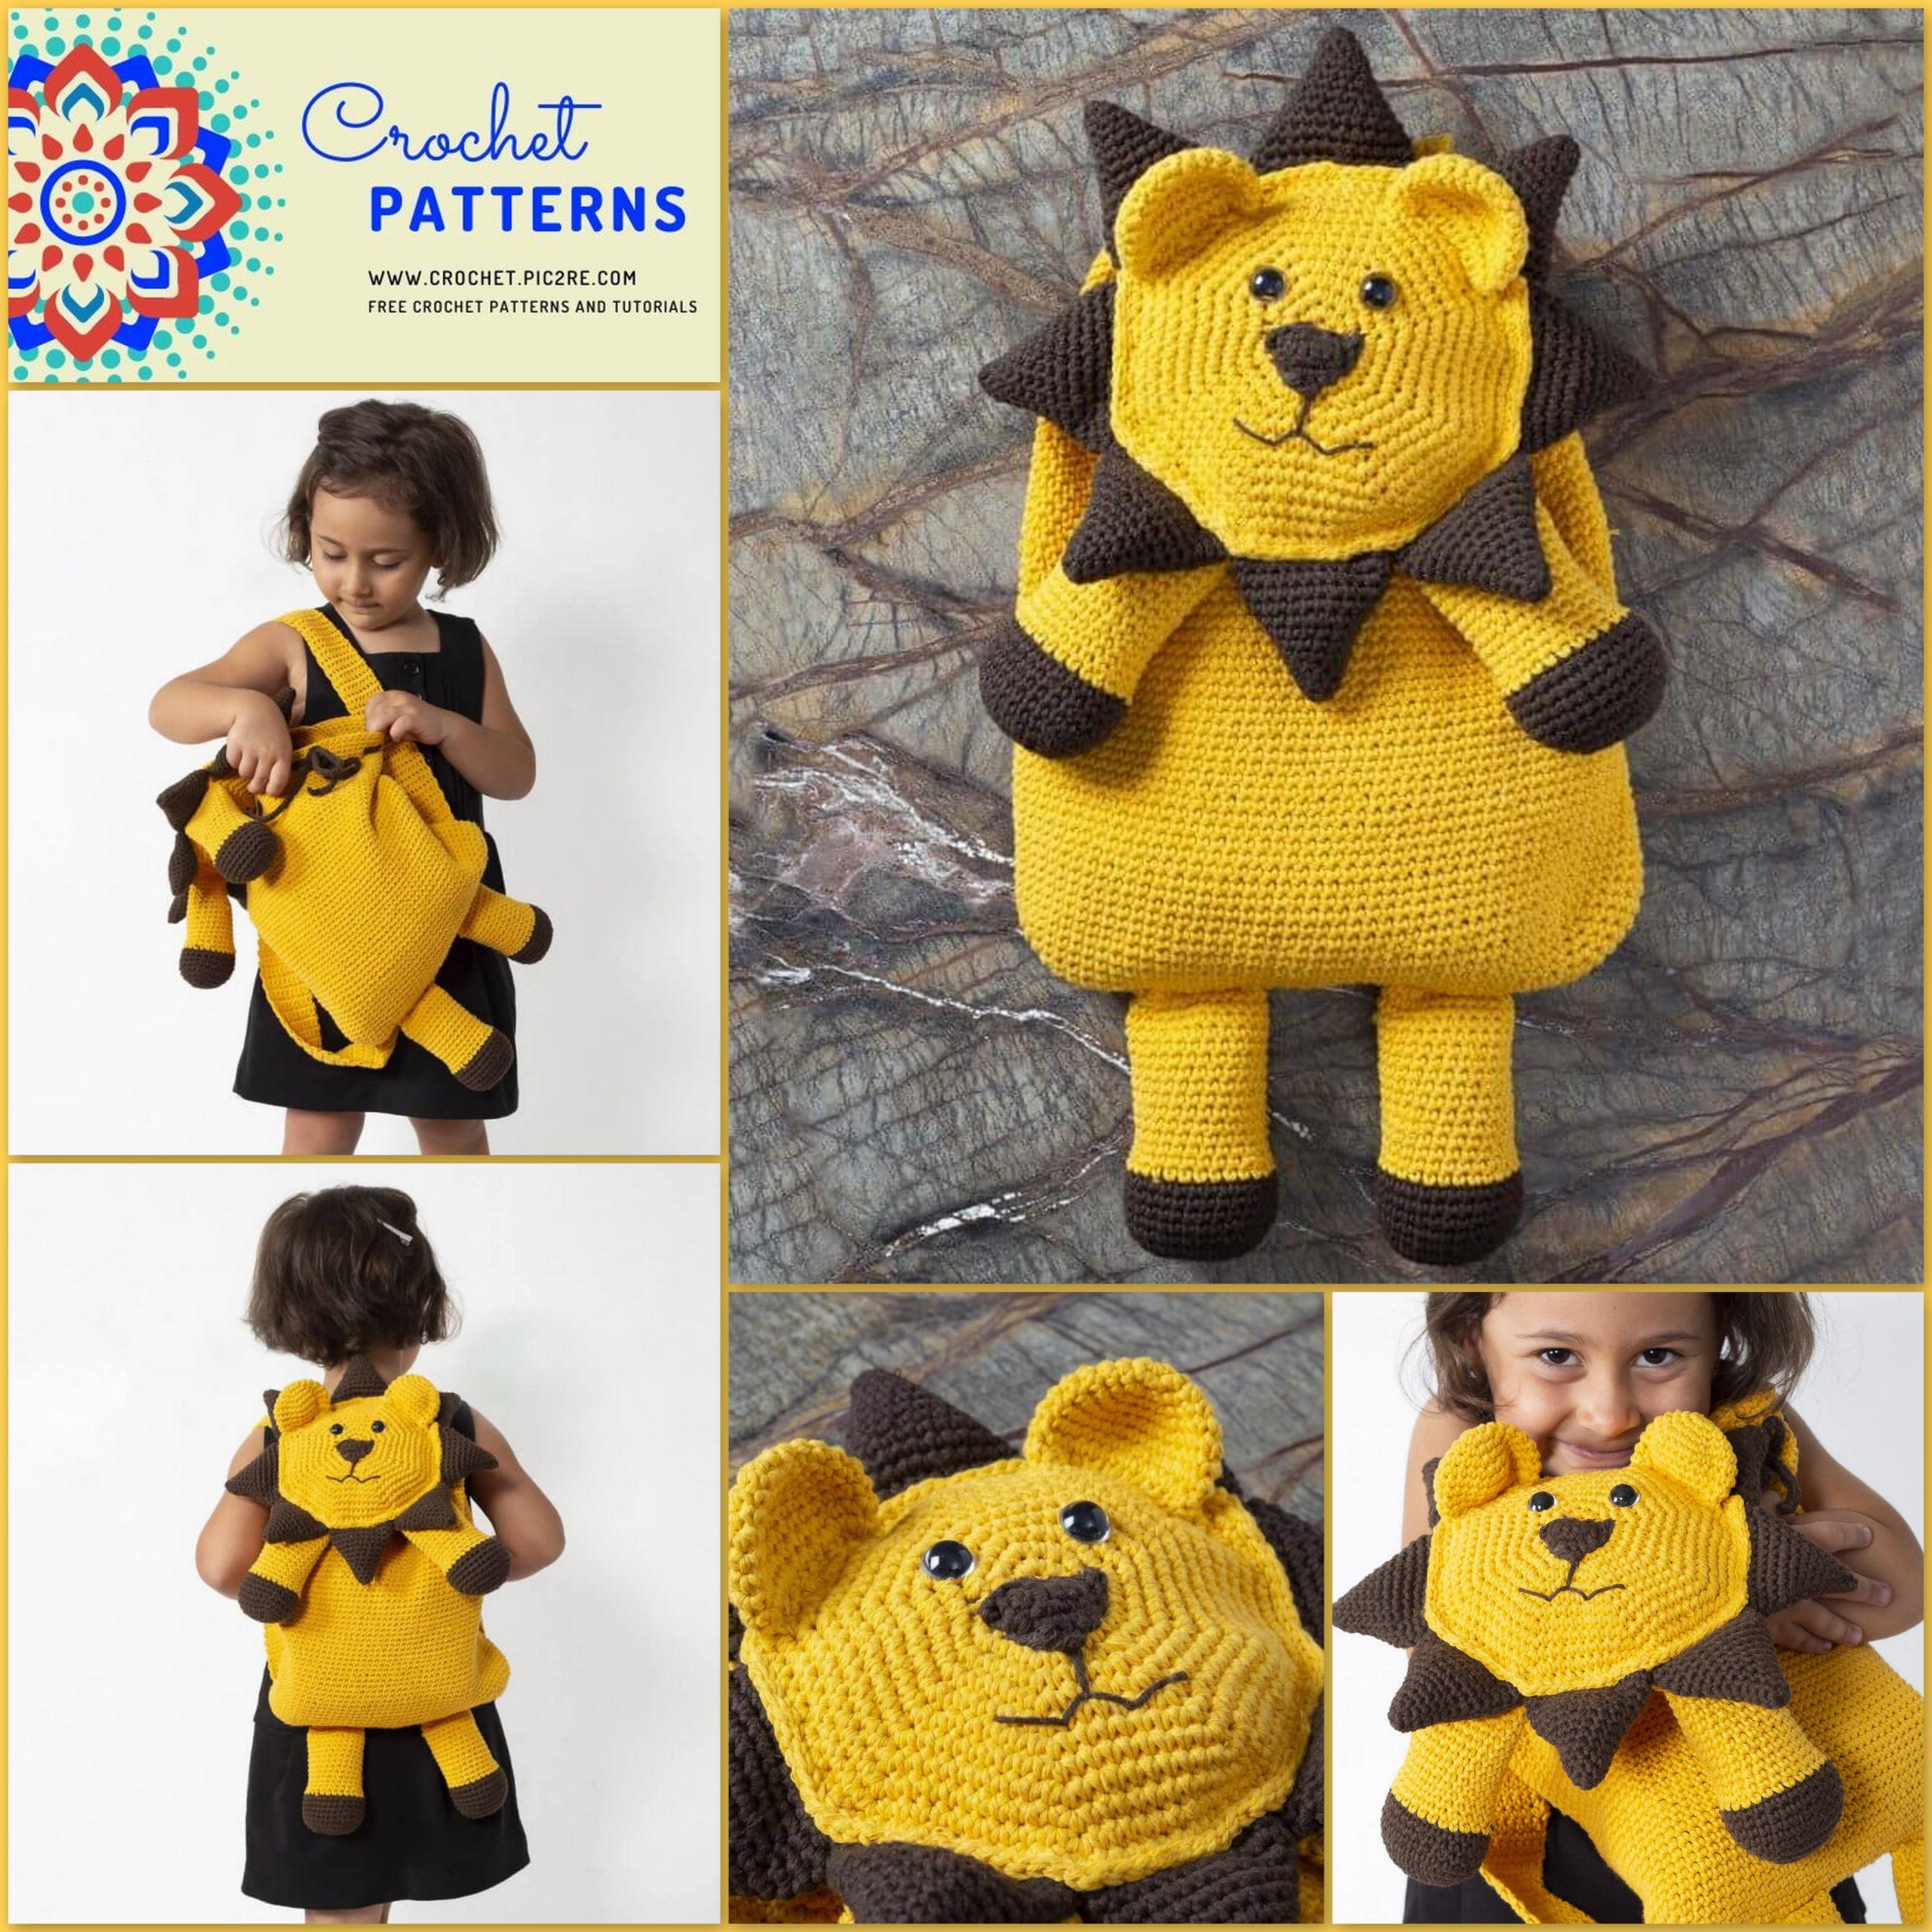 10 Free Crochet Lion Amigurumi Patterns - 99 Crochet | 2560x2560